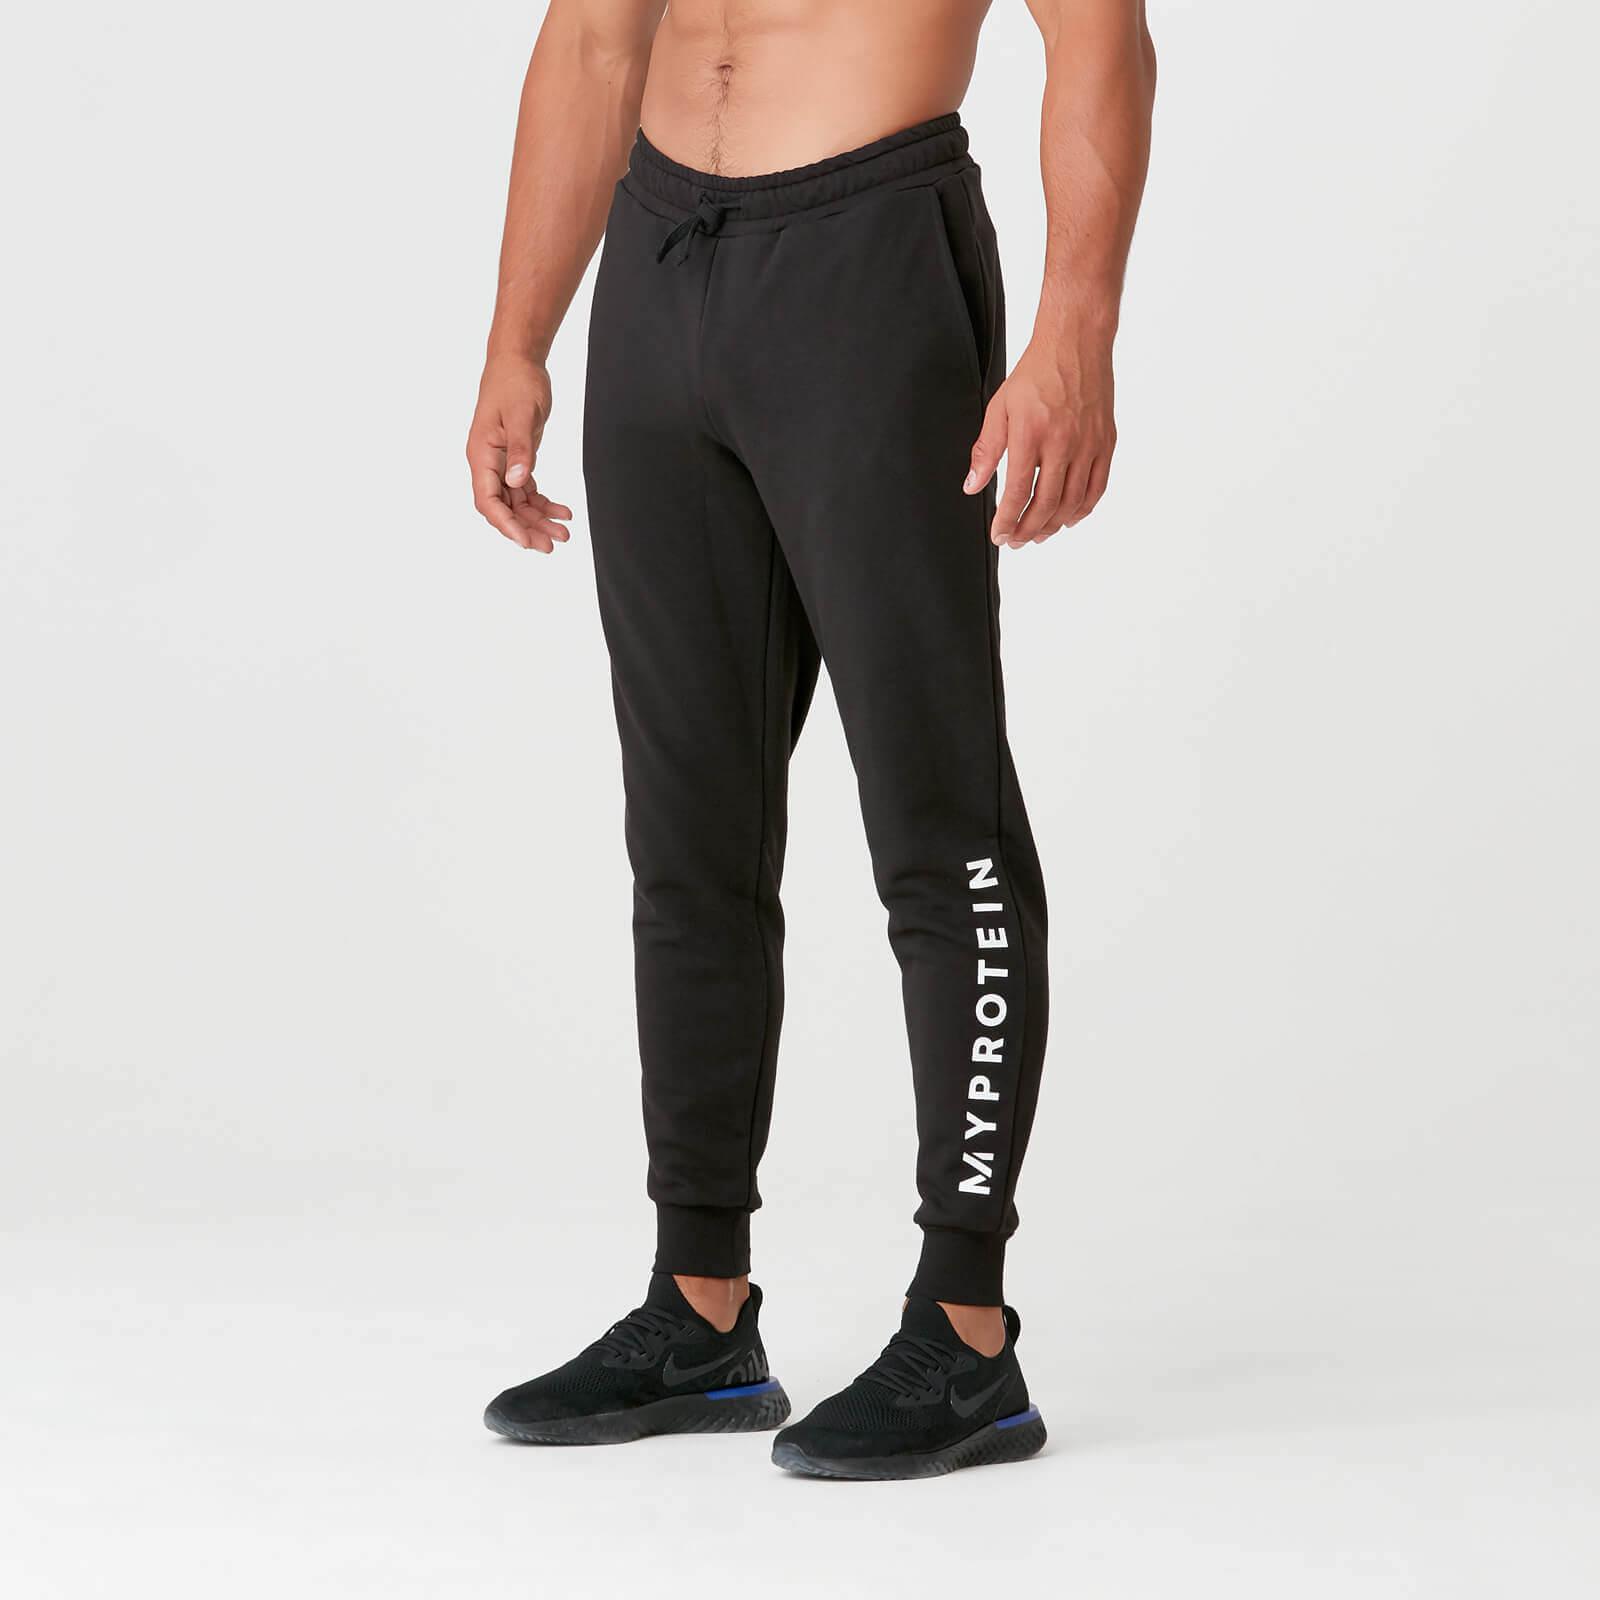 Myprotein De original joggingbroek - XL